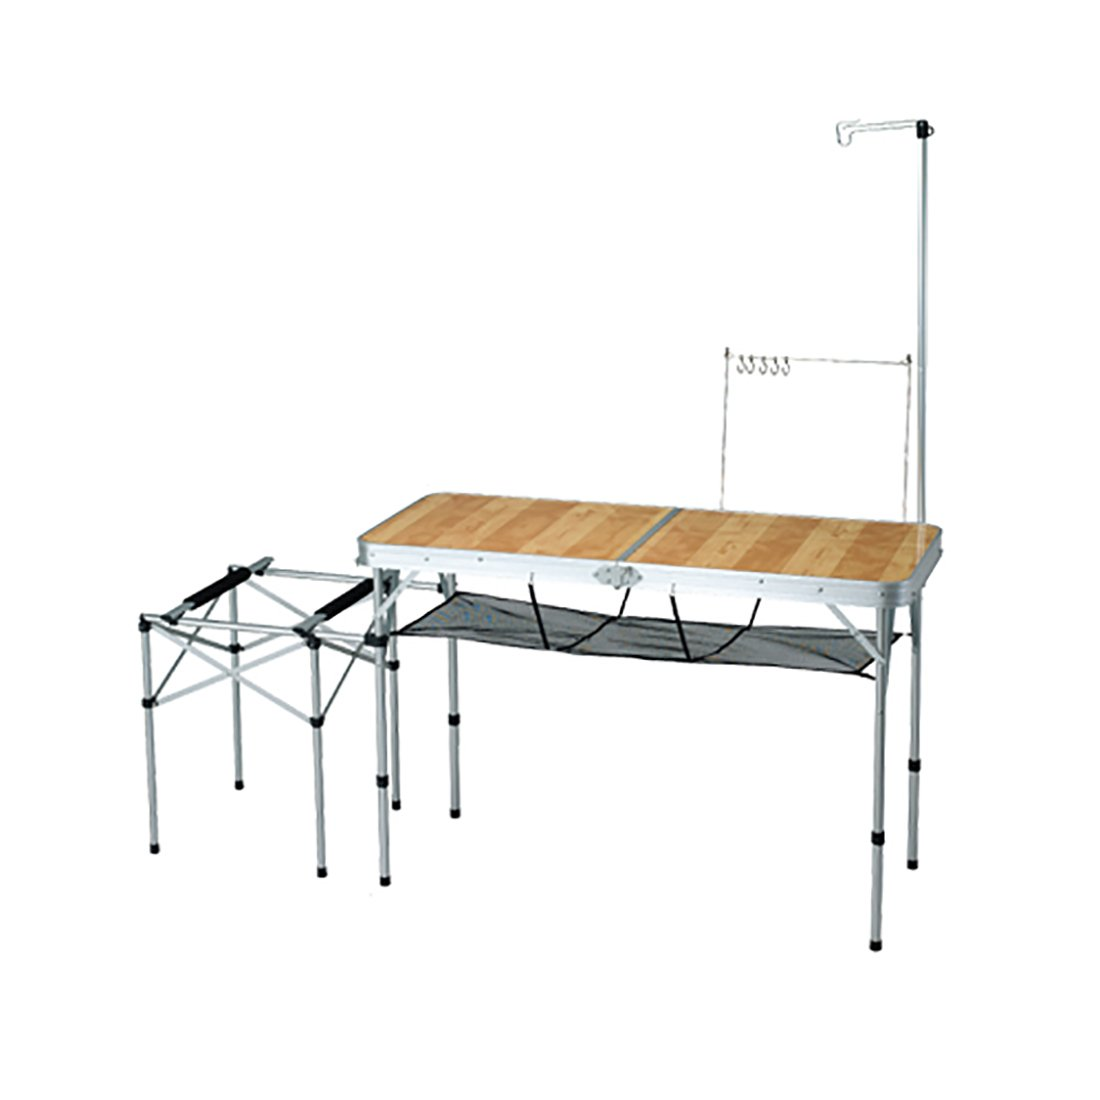 2 way kitchen table large II